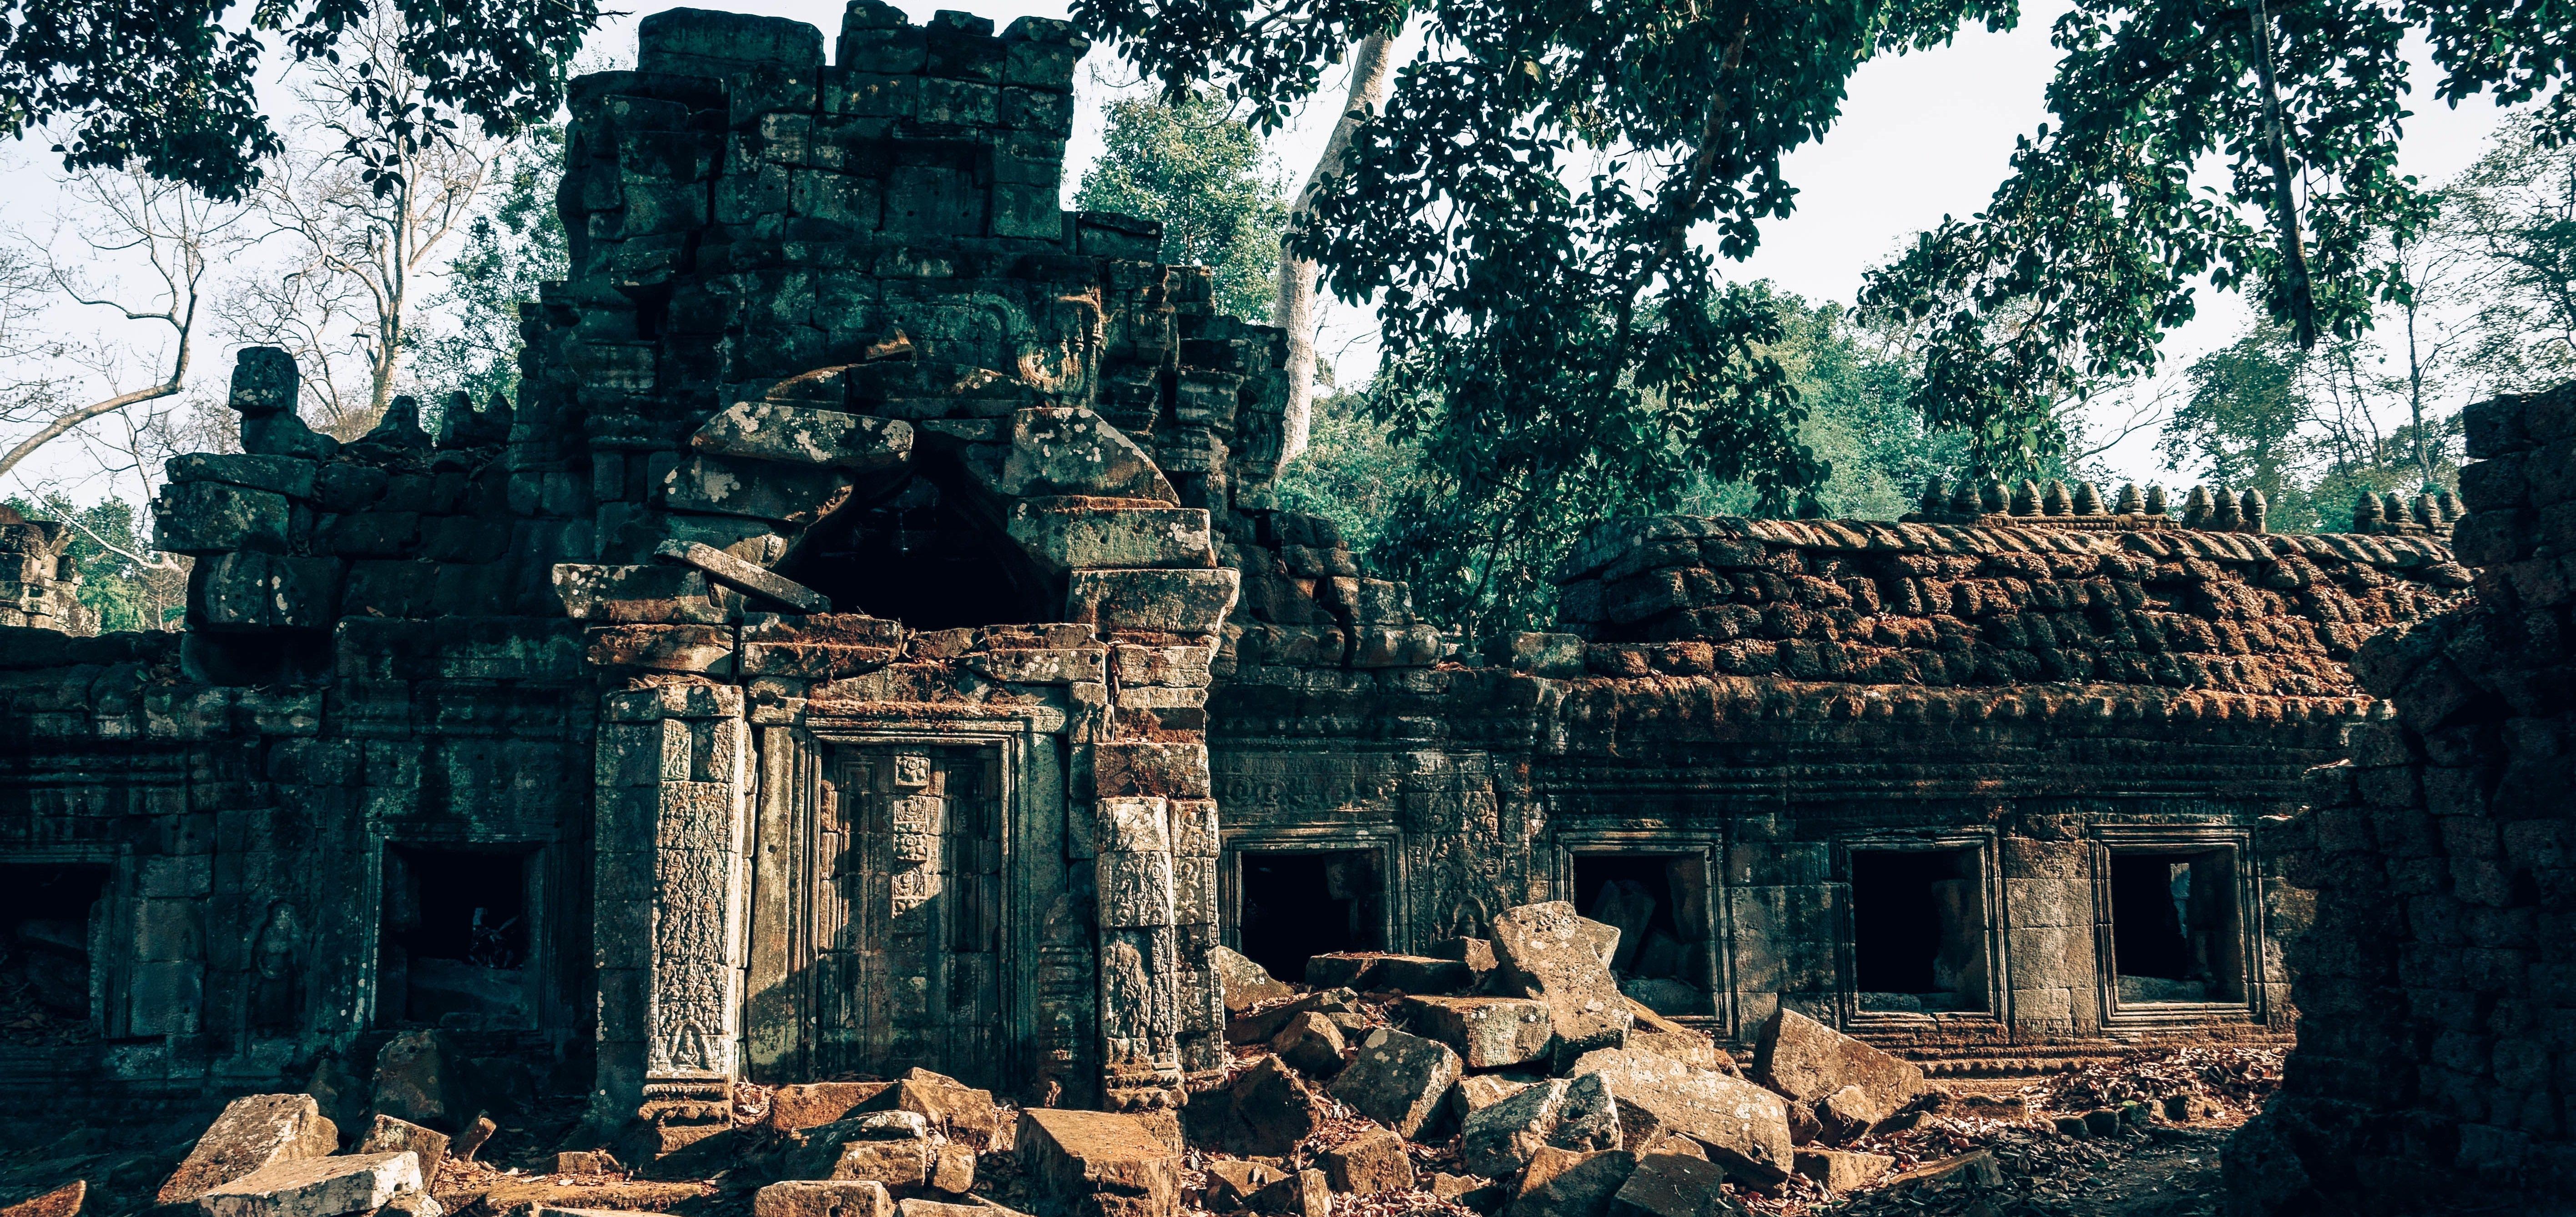 antica struttura